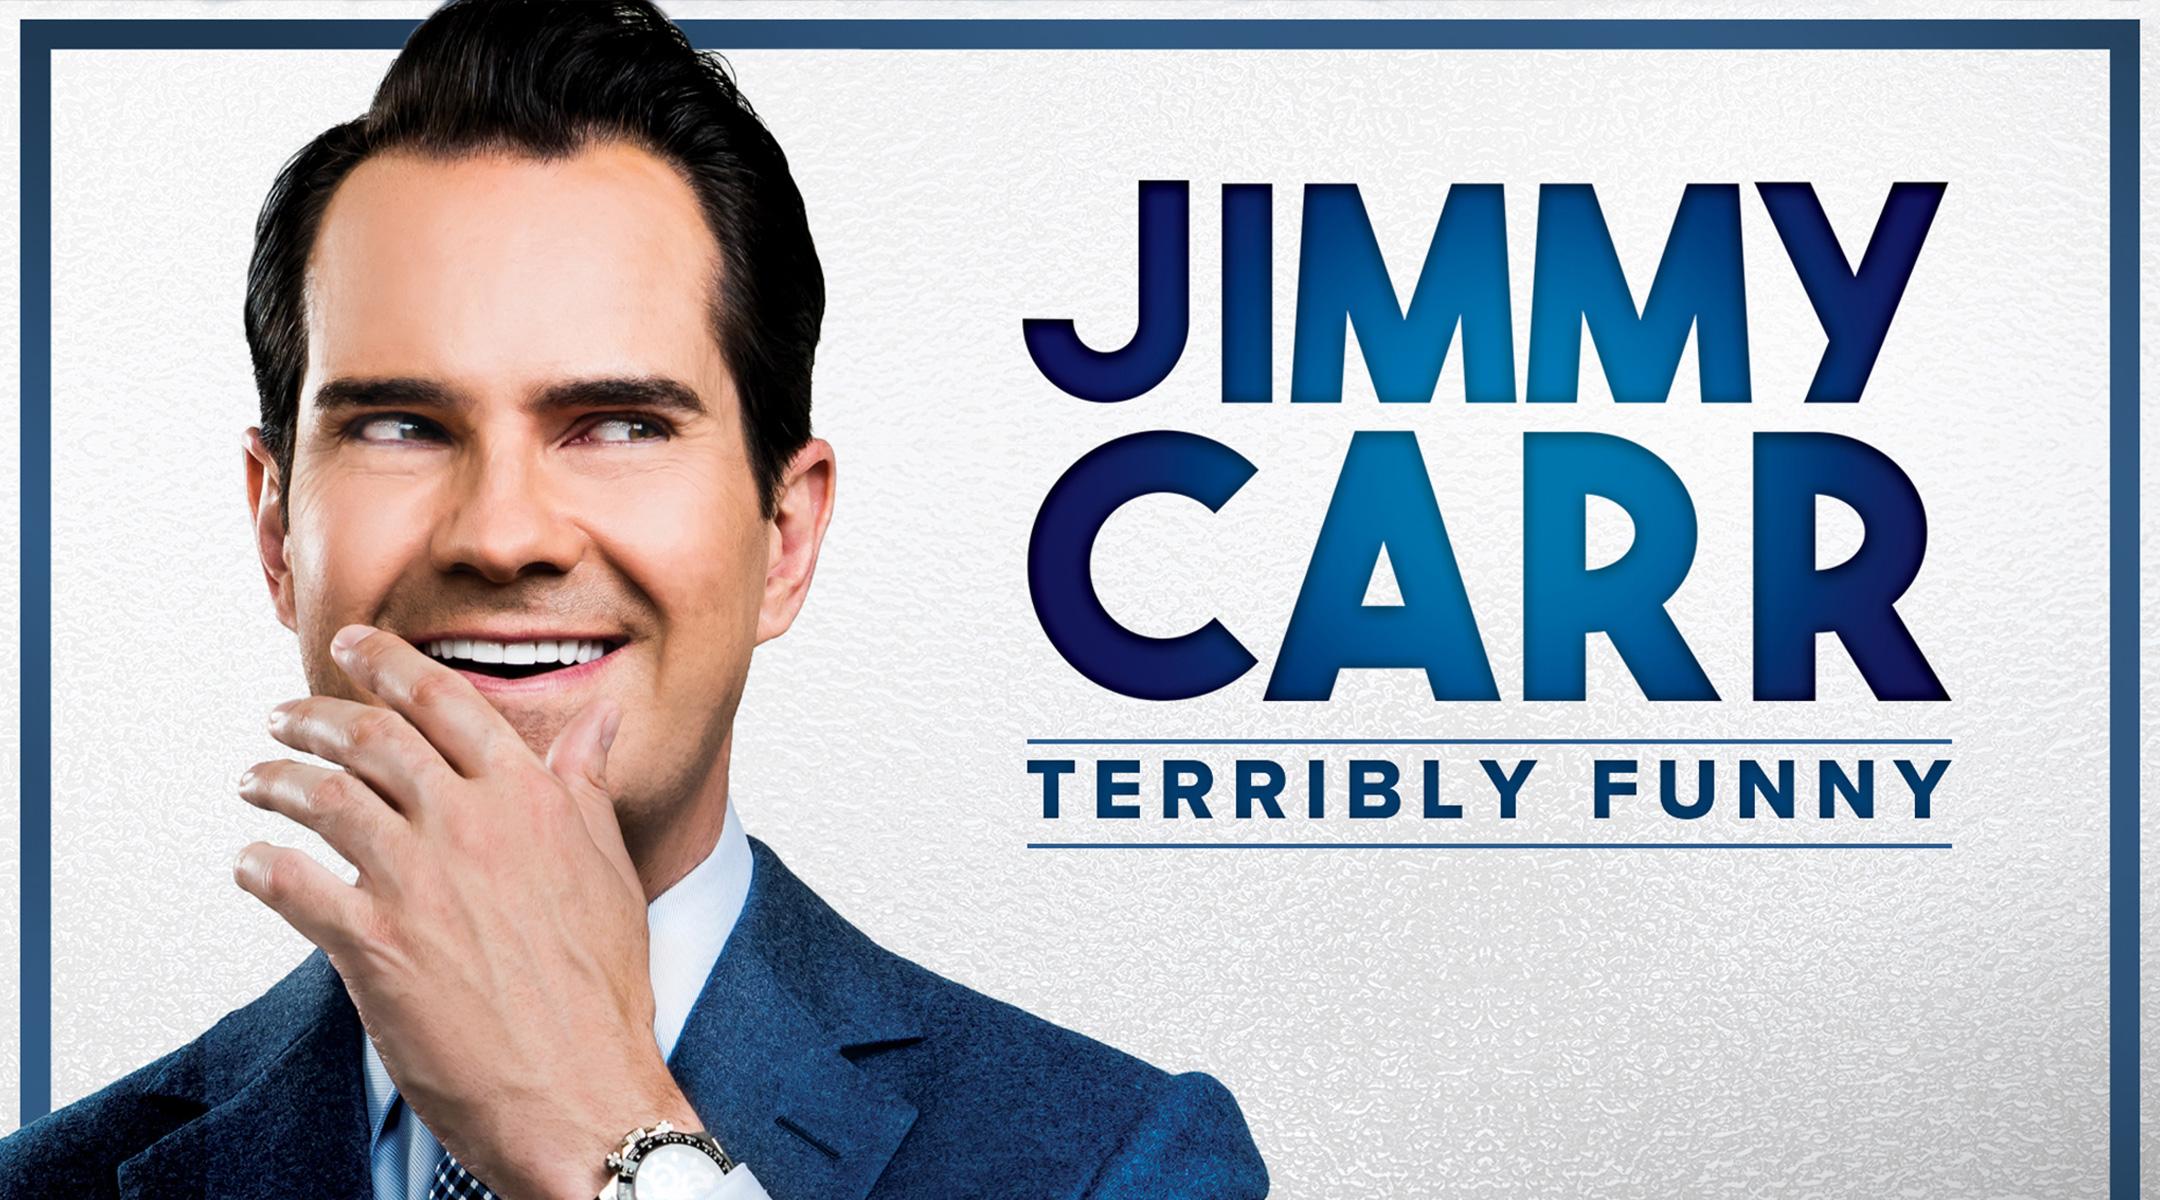 Jimmy Carr: Terribly Funny - Northampton - 26th